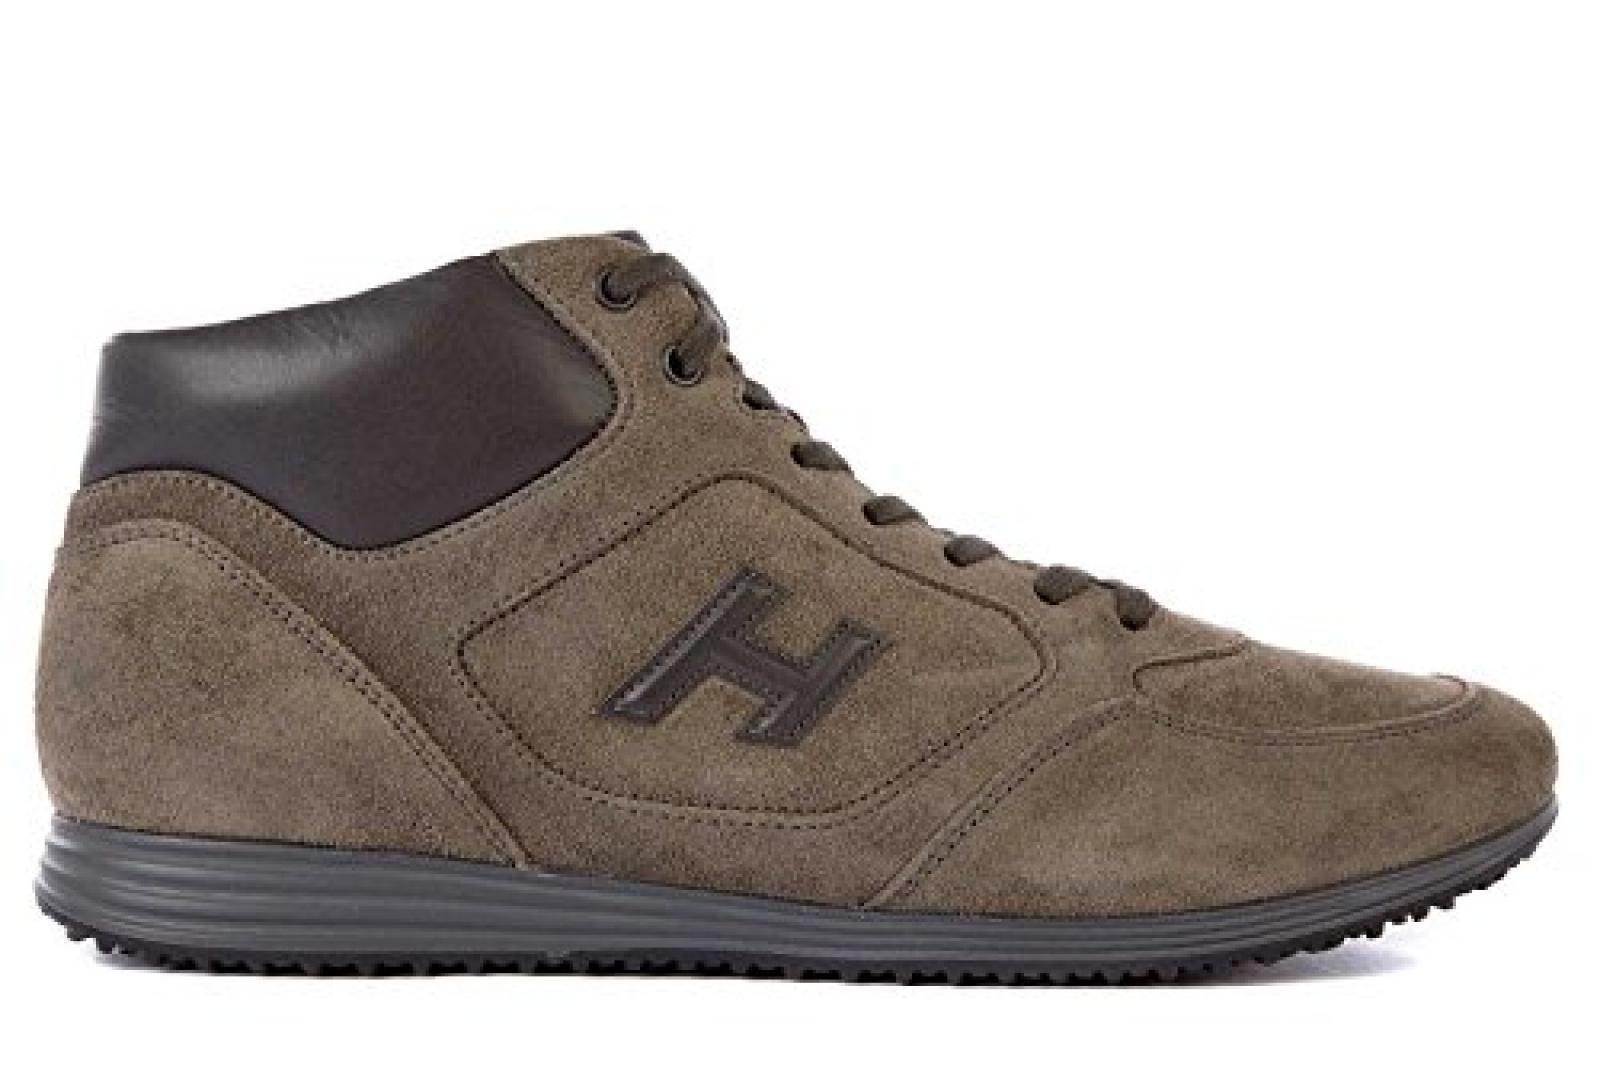 Hogan Herrenschuhe Herren Wildleder Sneakers Schuhe h 205 Grau